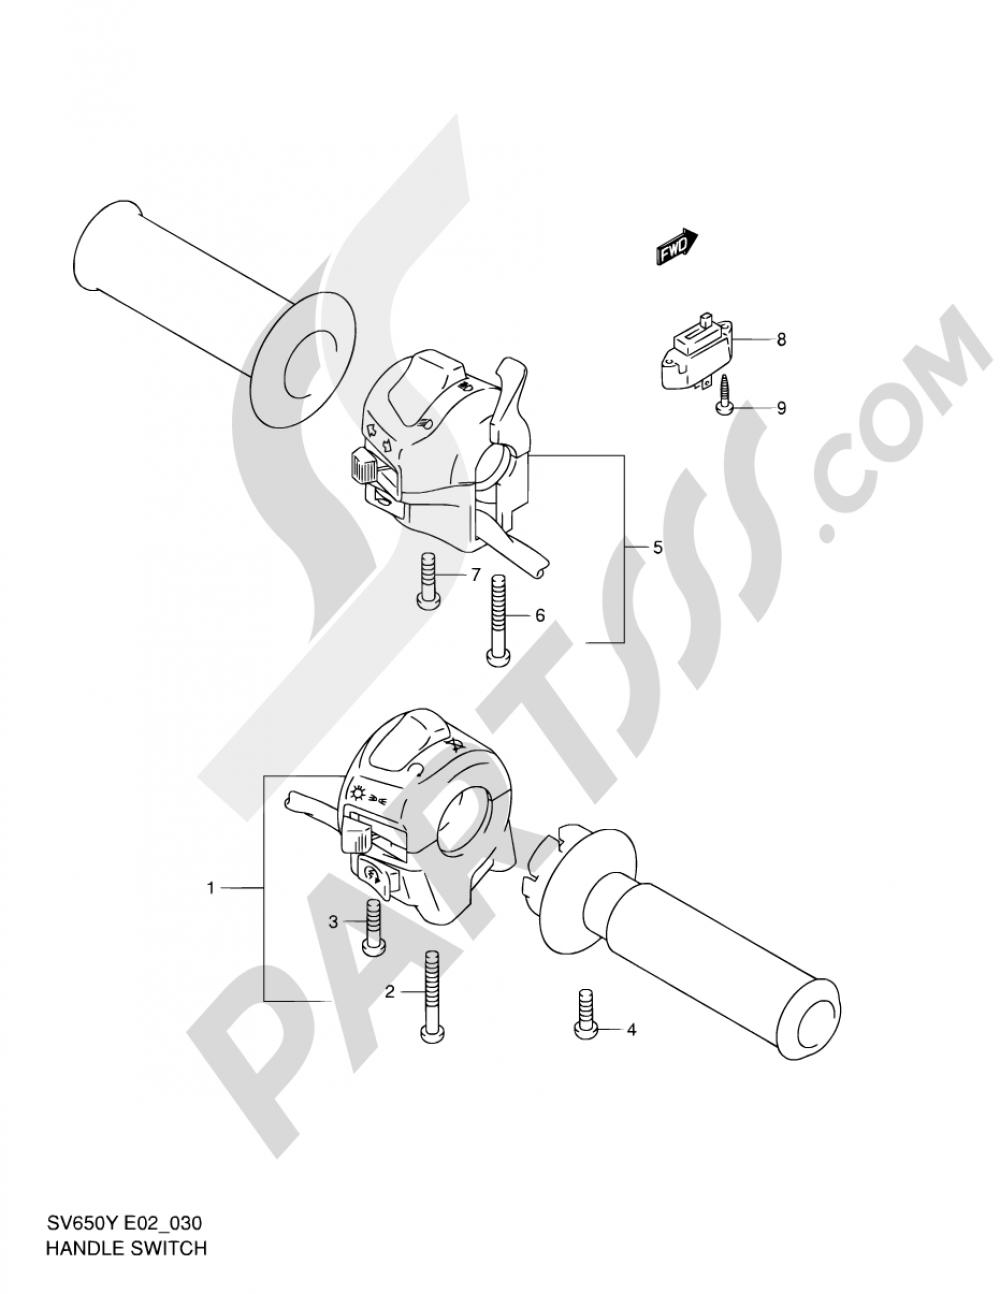 30 - HANDLE SWITCH (SV650X/UX/Y/UY/K1/UK1/K2/UK2) Suzuki SV650 2002